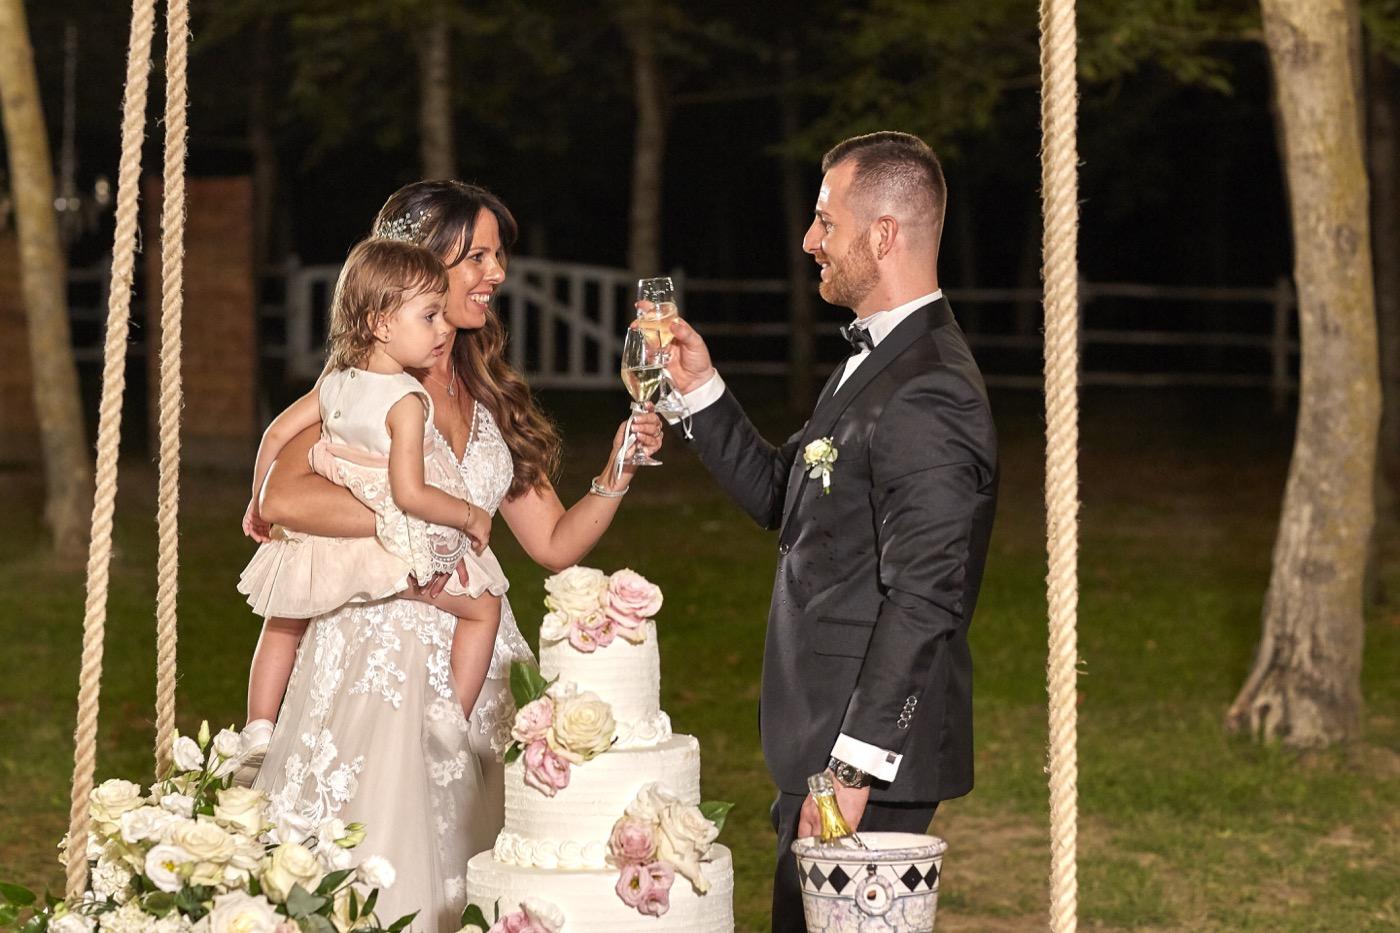 Claudio-Coppola-wedding-photographer-la-scuderia-eventi-preparativi-la-rosetta-perugia-92